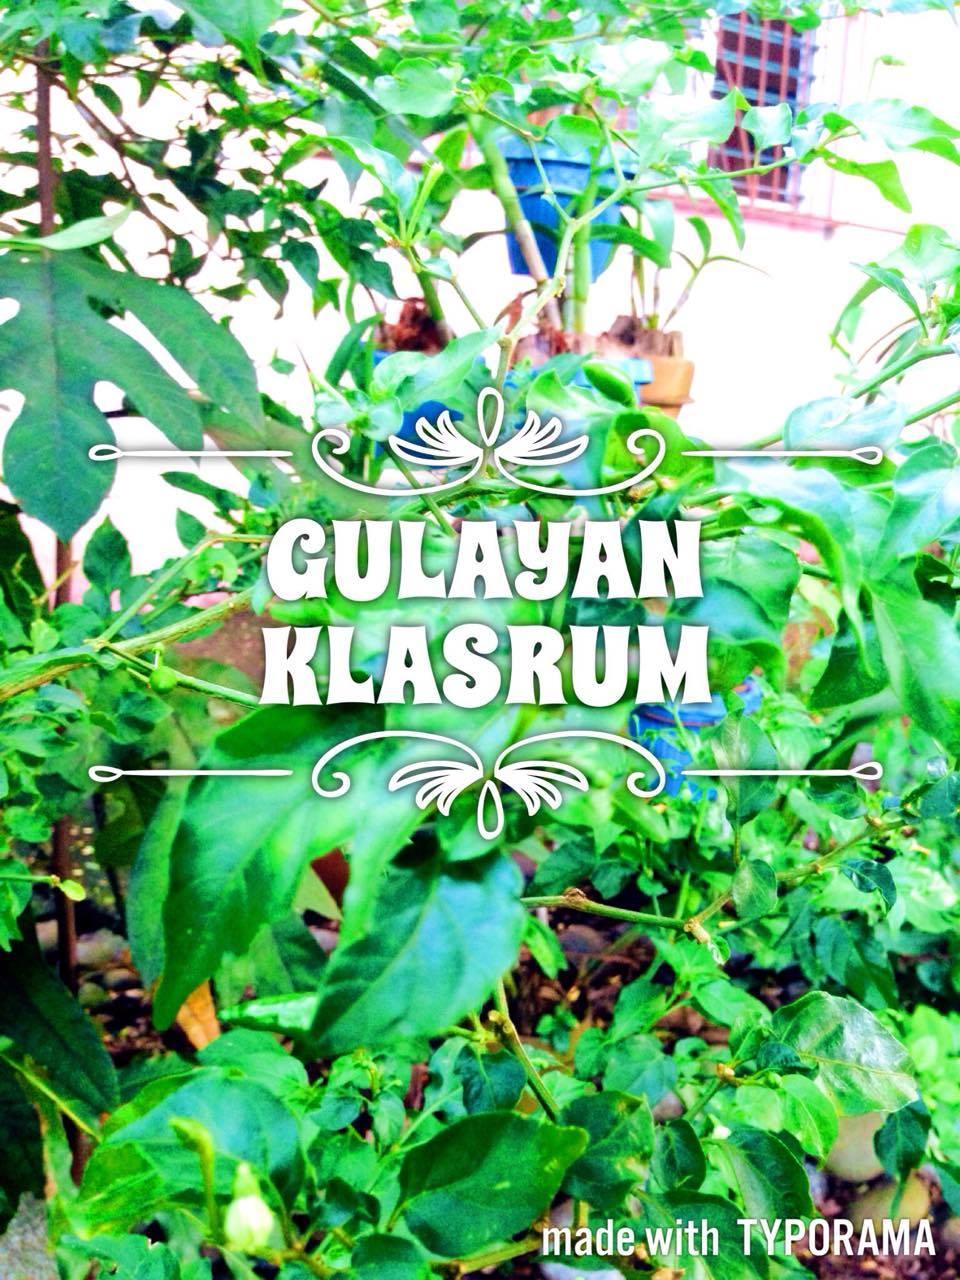 gulayan klasrum 2010 palanca winners honored by tawid news team on september 11, 2010 in latest news (gulayan klasrum) 2nd – marianito l dio jr (ang aking pangalan.